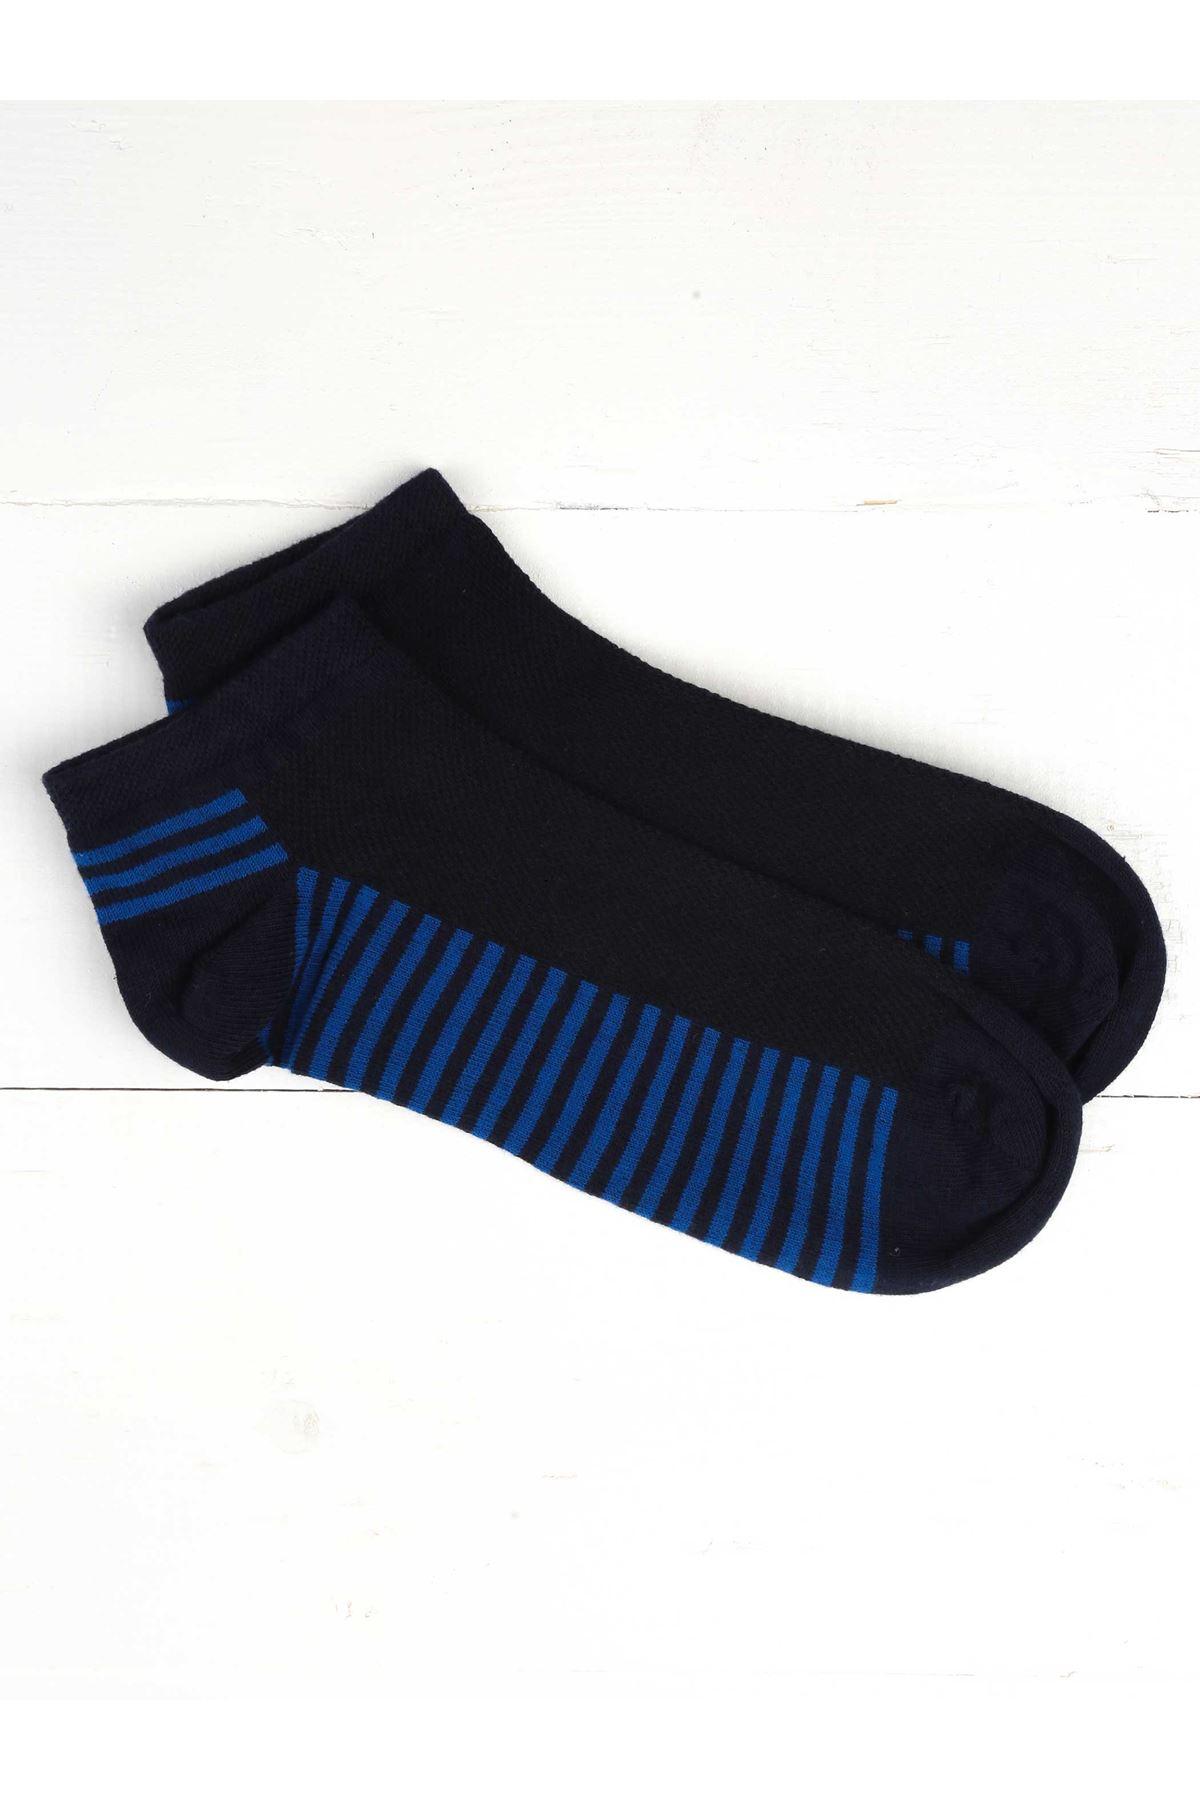 Navy Sax Striped Perfumed Men's Booties Socks